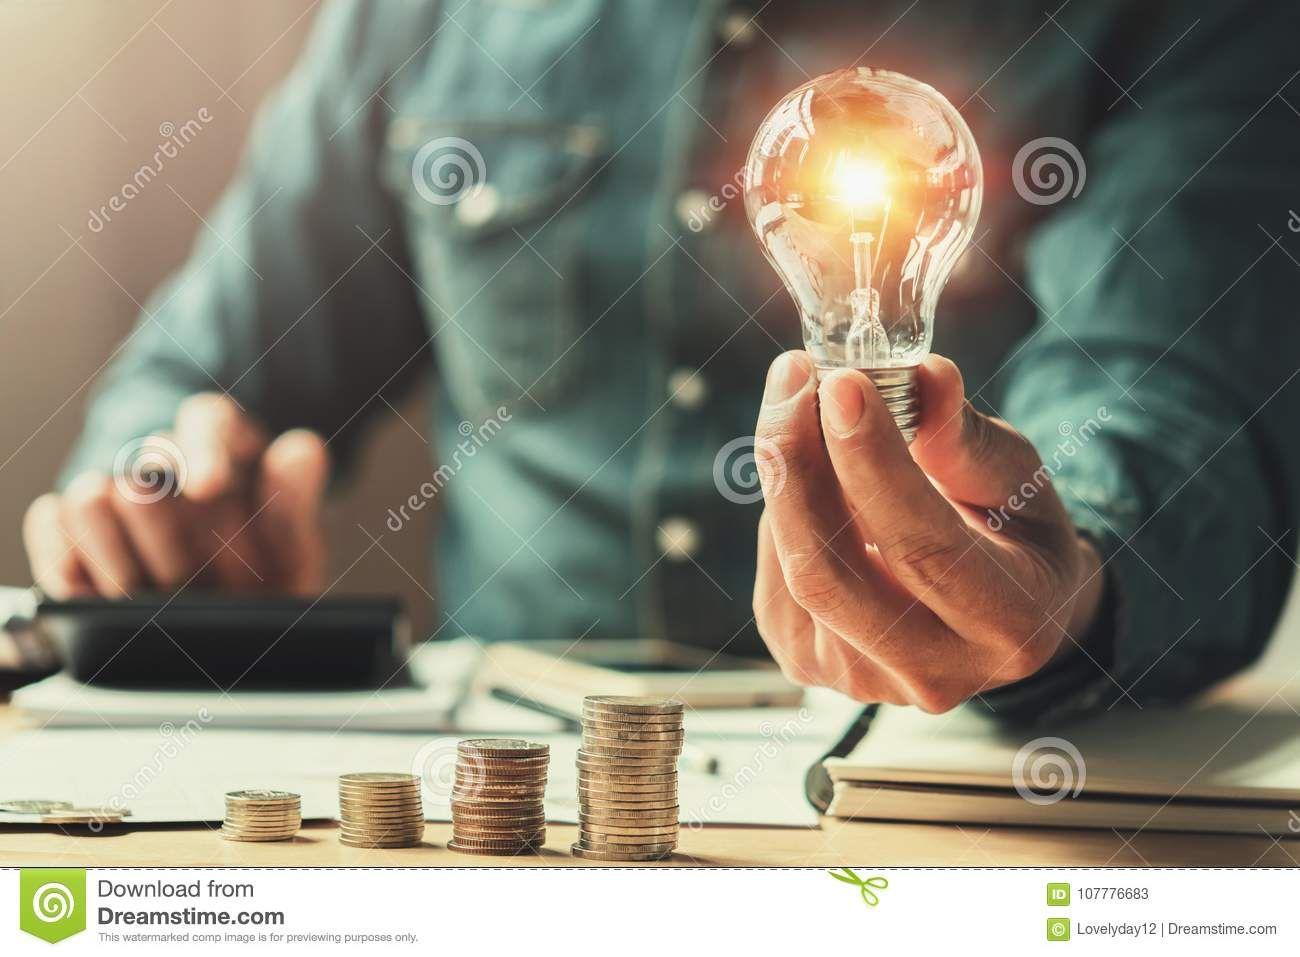 Business Finance And Saving Power  New Idea Solar Energy Stock Image